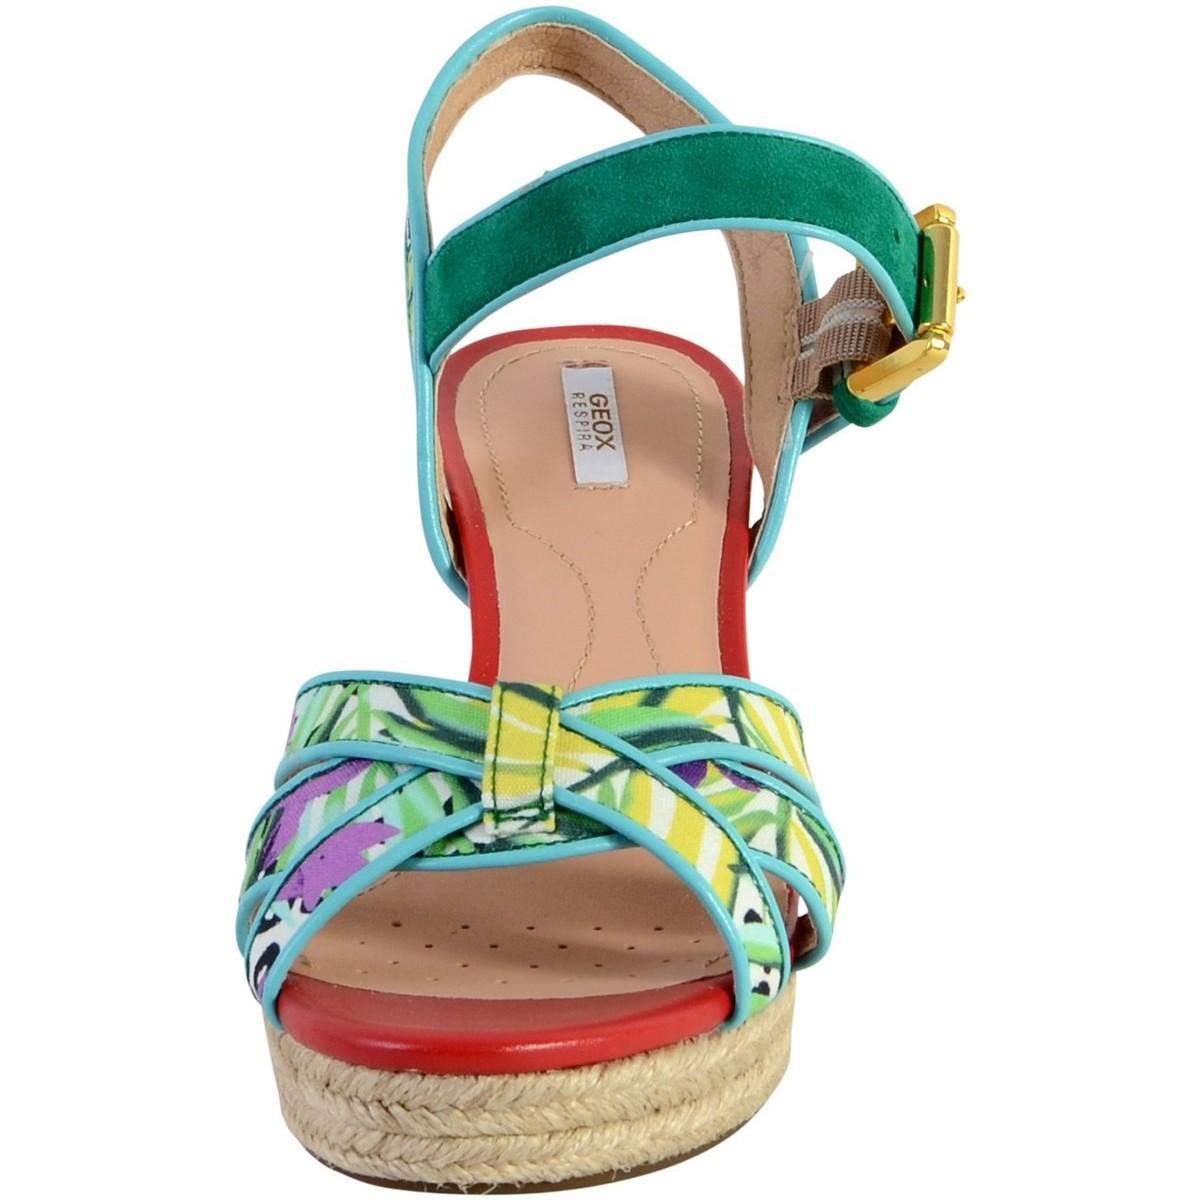 Geox Suede Femmes Sandale Goat Sandales En Multicolor A D Soleil TK3uFJcl1